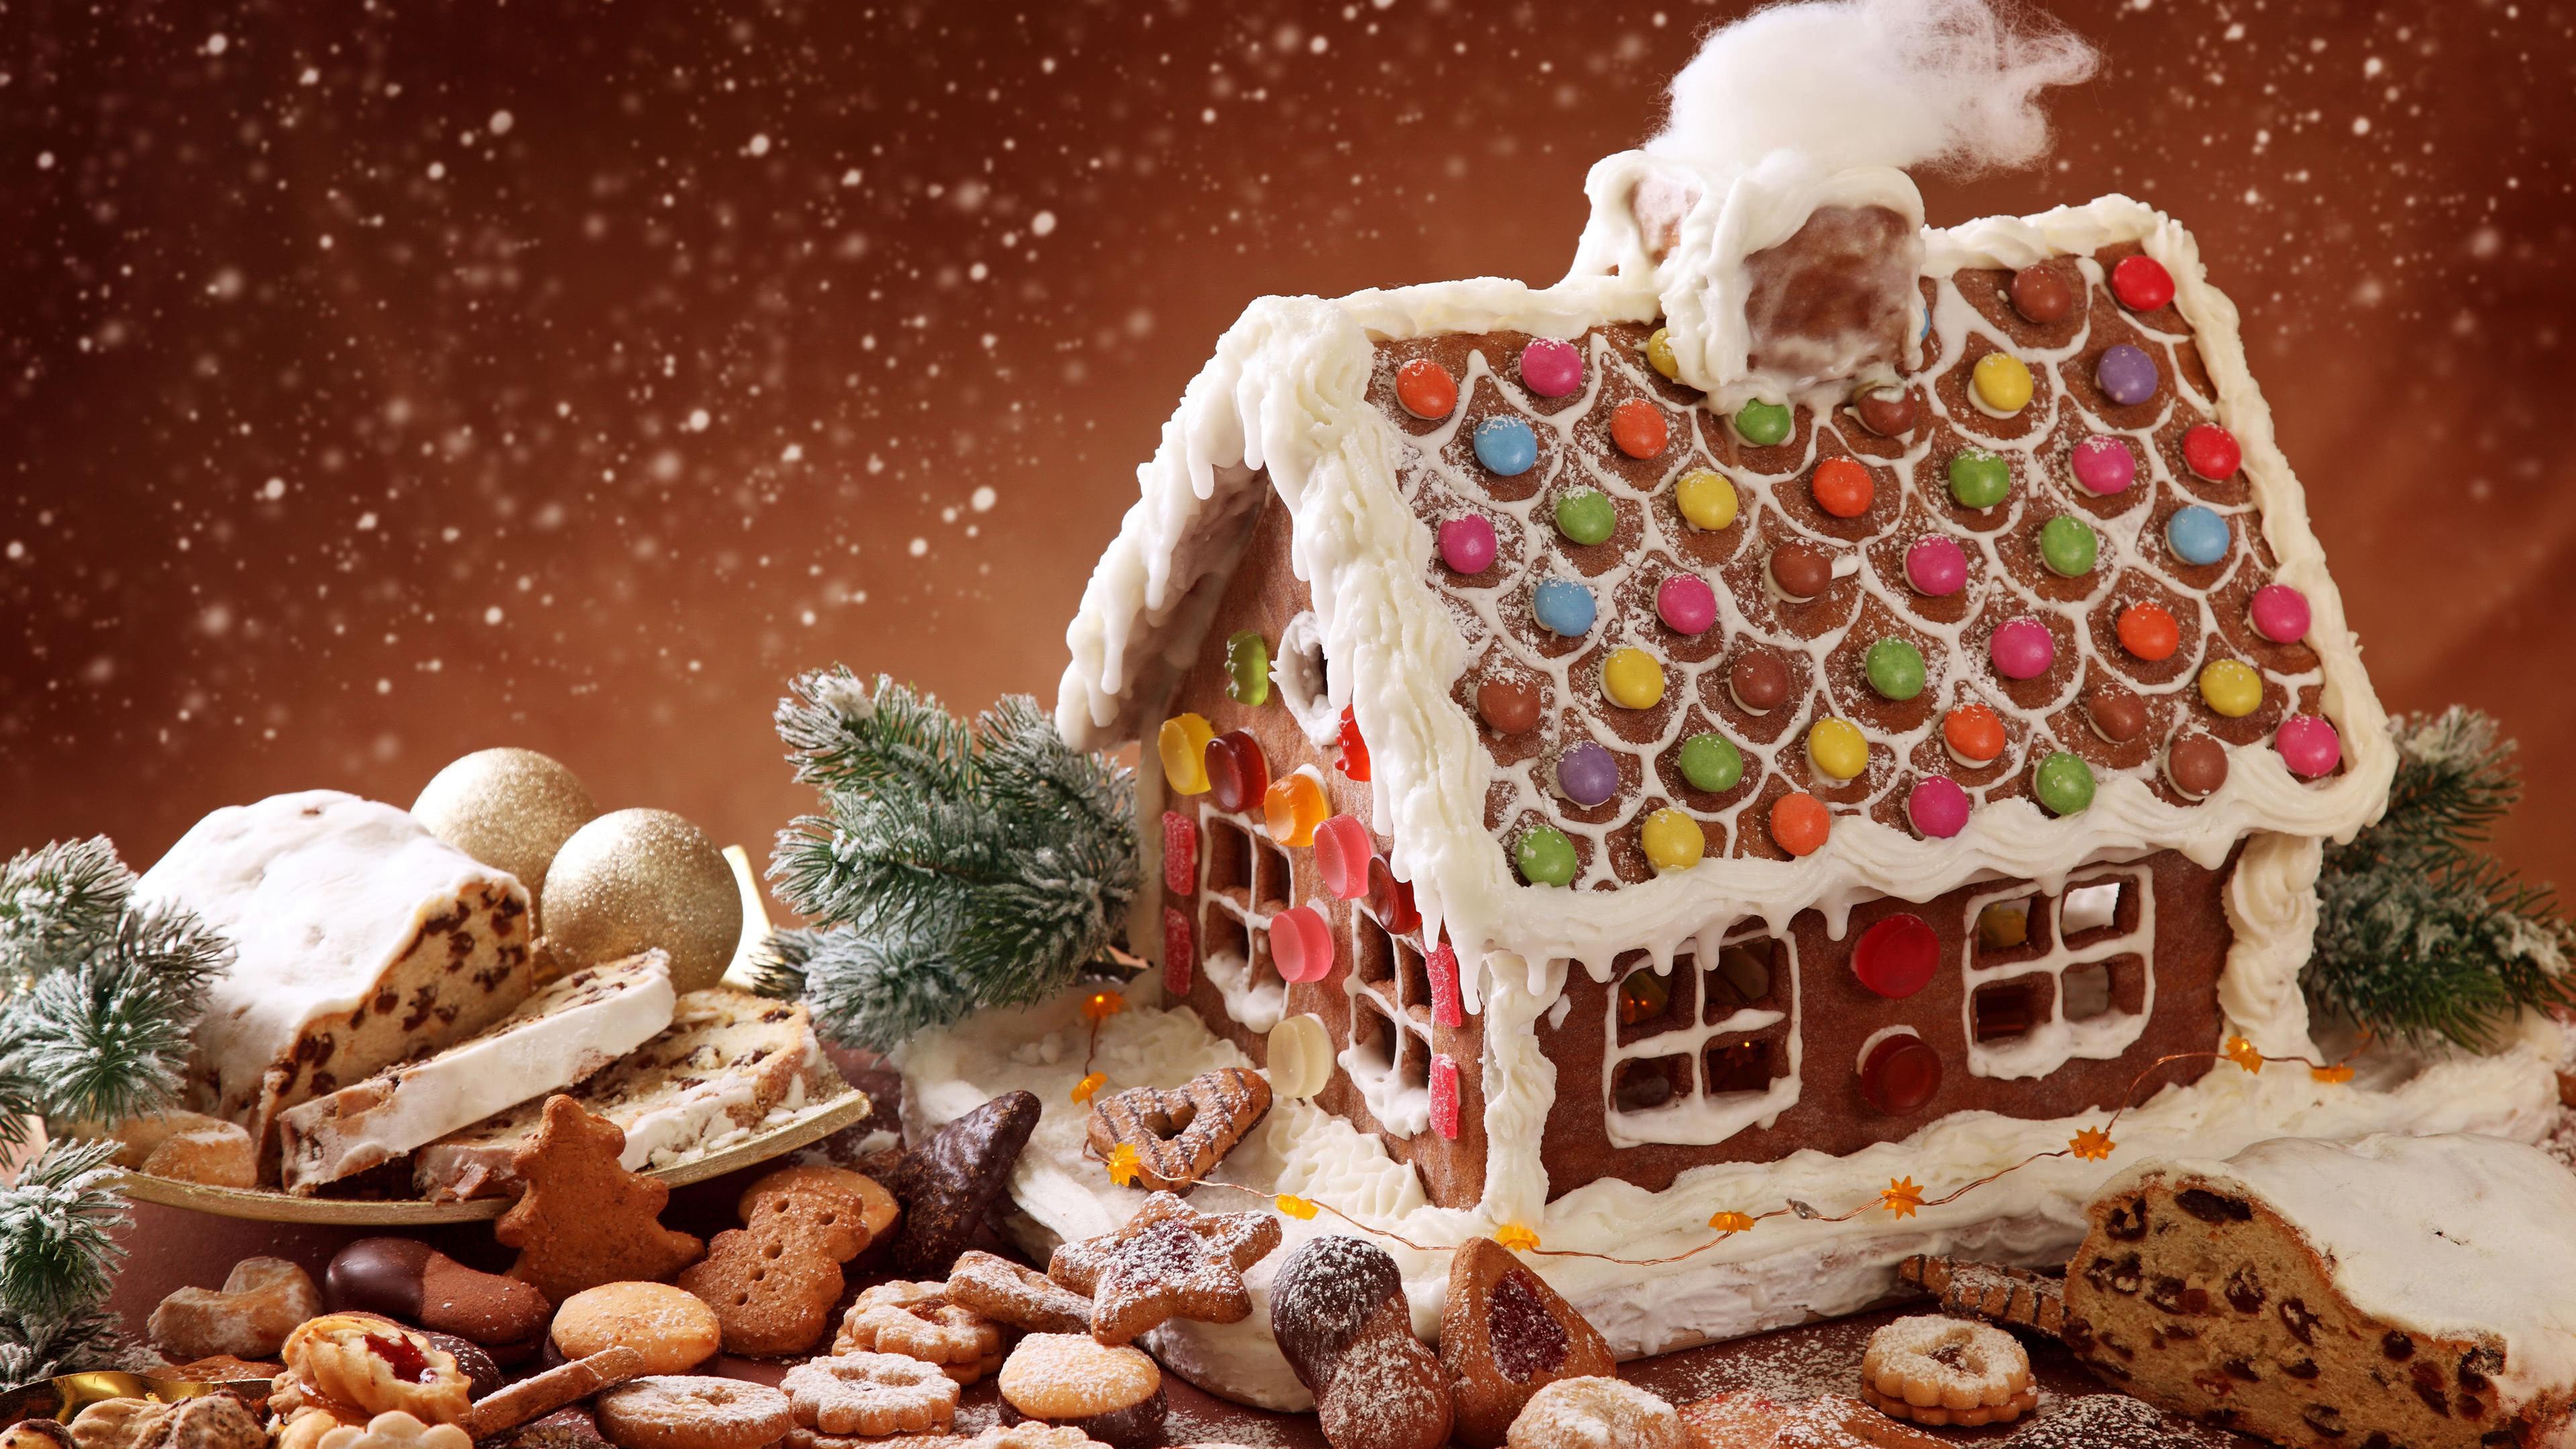 christmas gingerbread house uhd 4k wallpaper